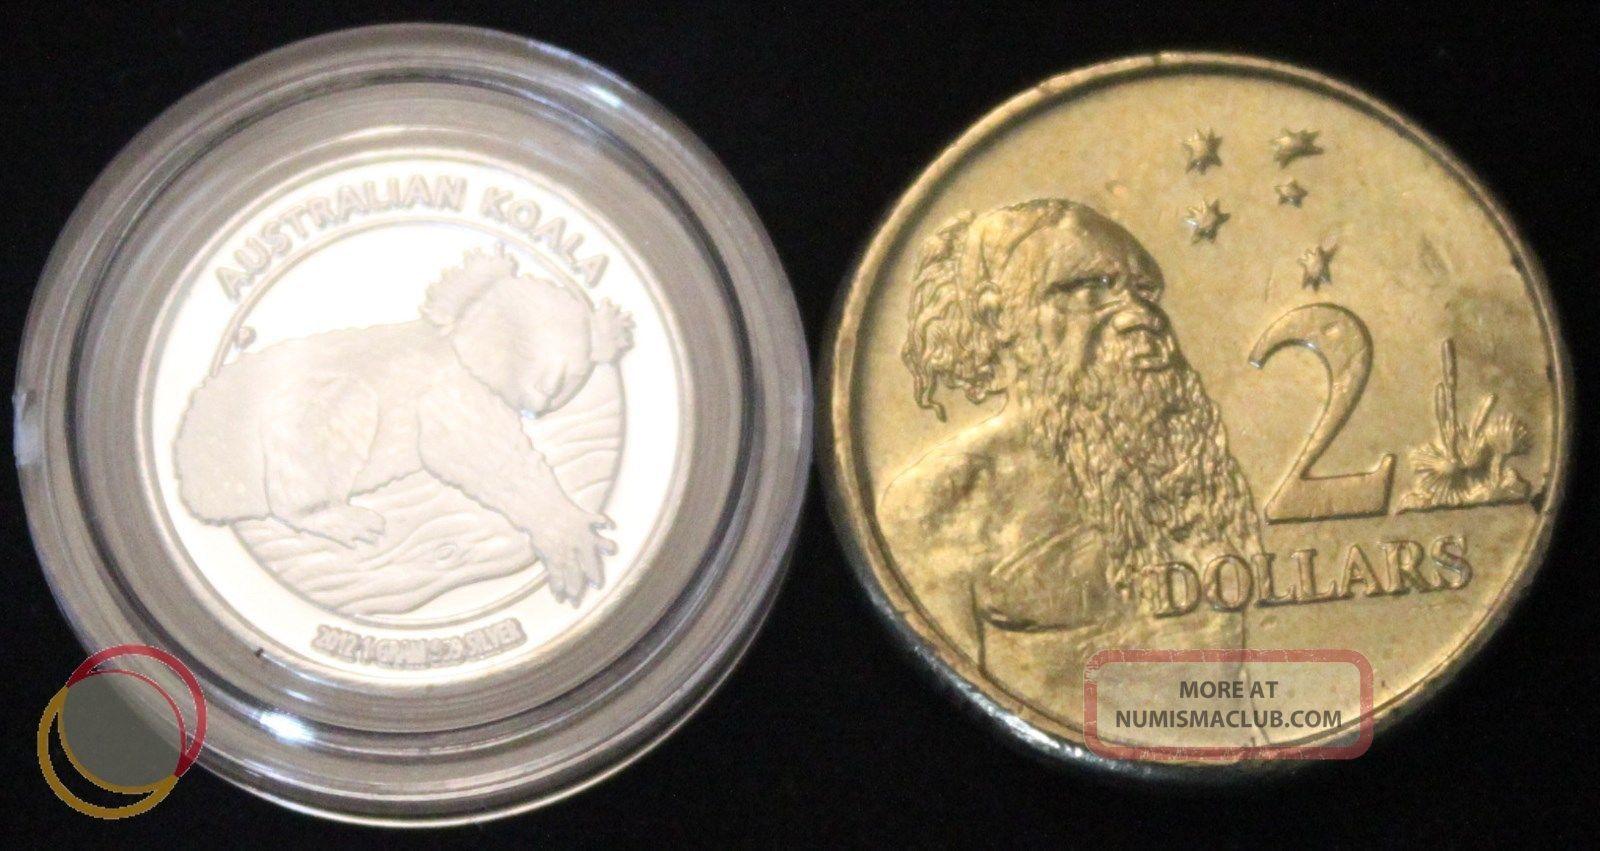 1 Gram Quot Australian Koala Quot 999 Solid Pure Silver Coin